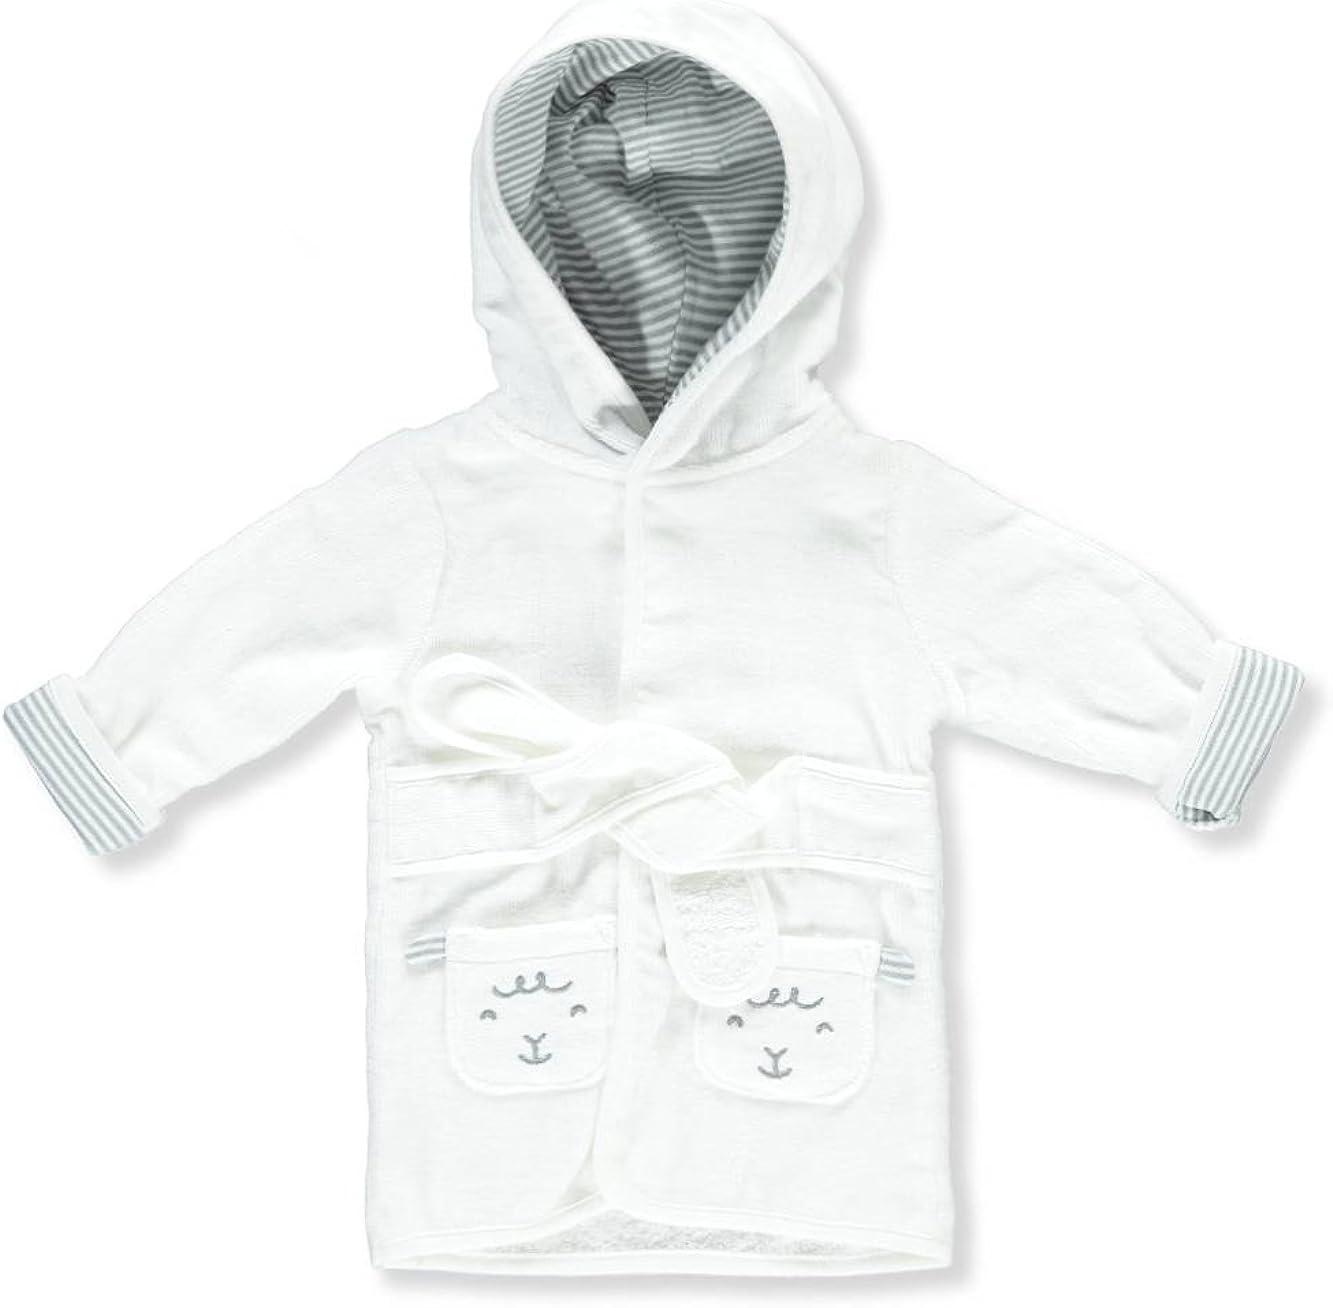 Carter's Baby's Hooded Robe